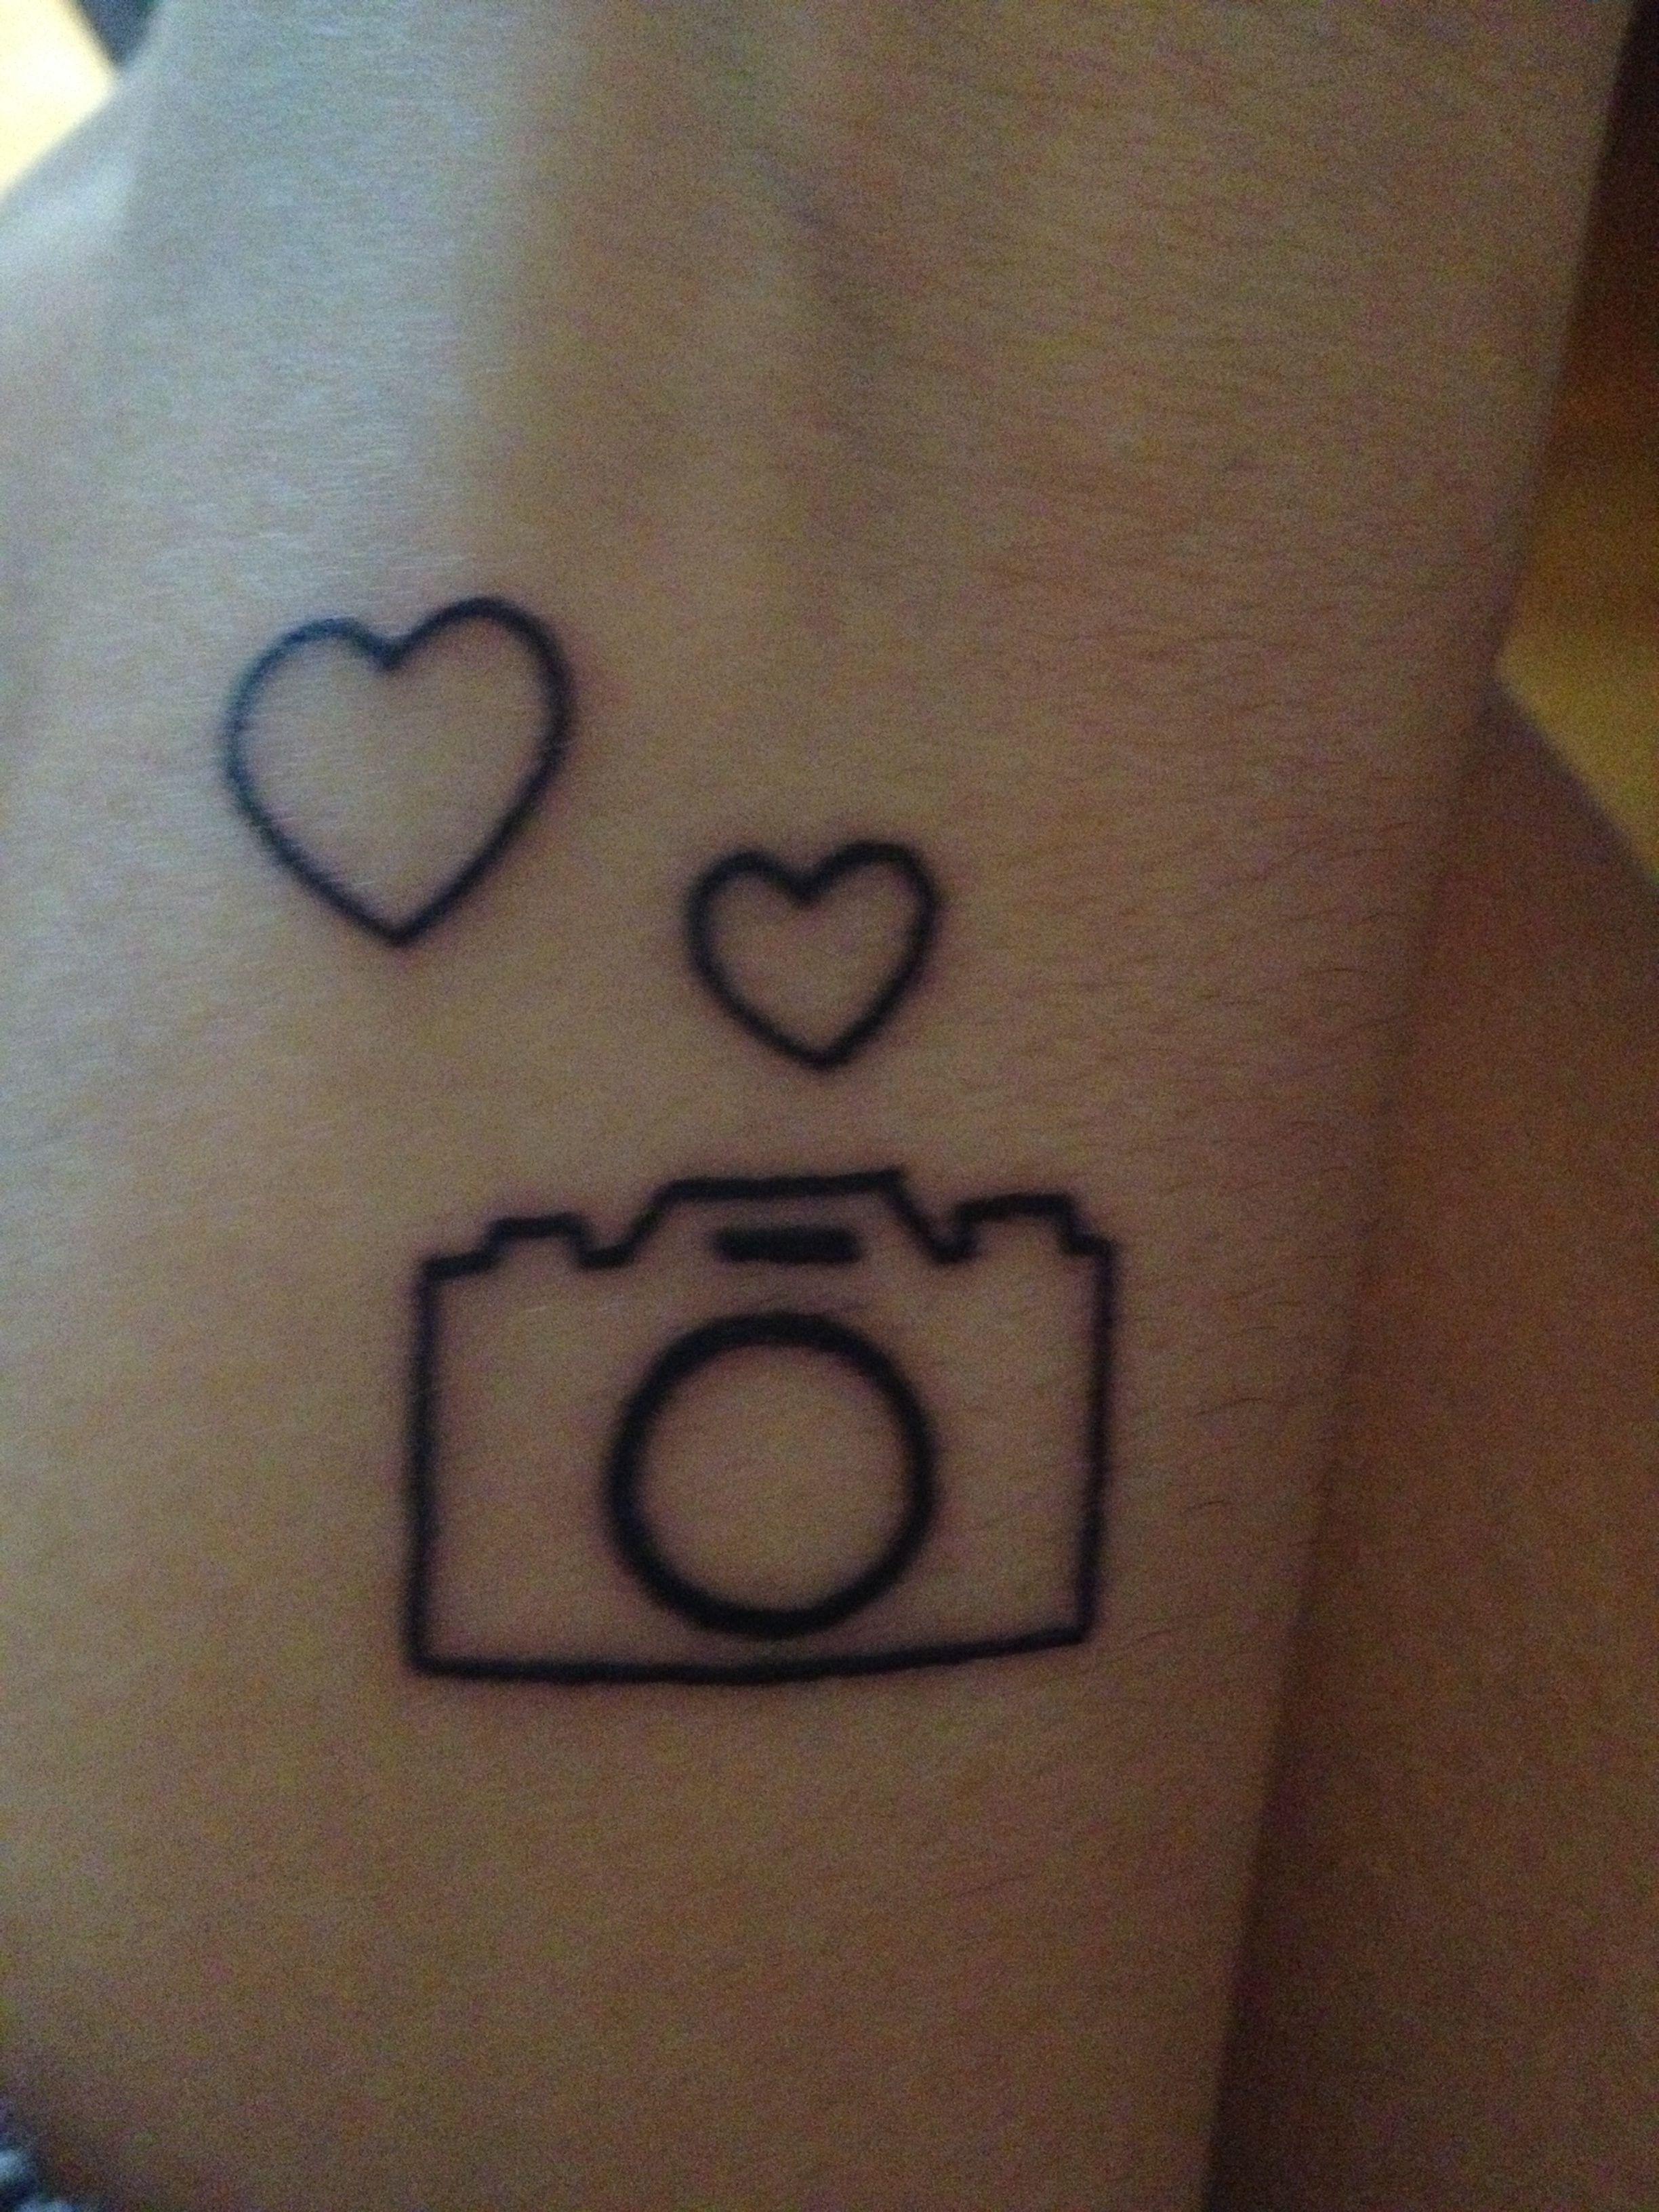 small camera tattoo dreaming a tatoo pinterest camera tattoos cameras and tattoo. Black Bedroom Furniture Sets. Home Design Ideas